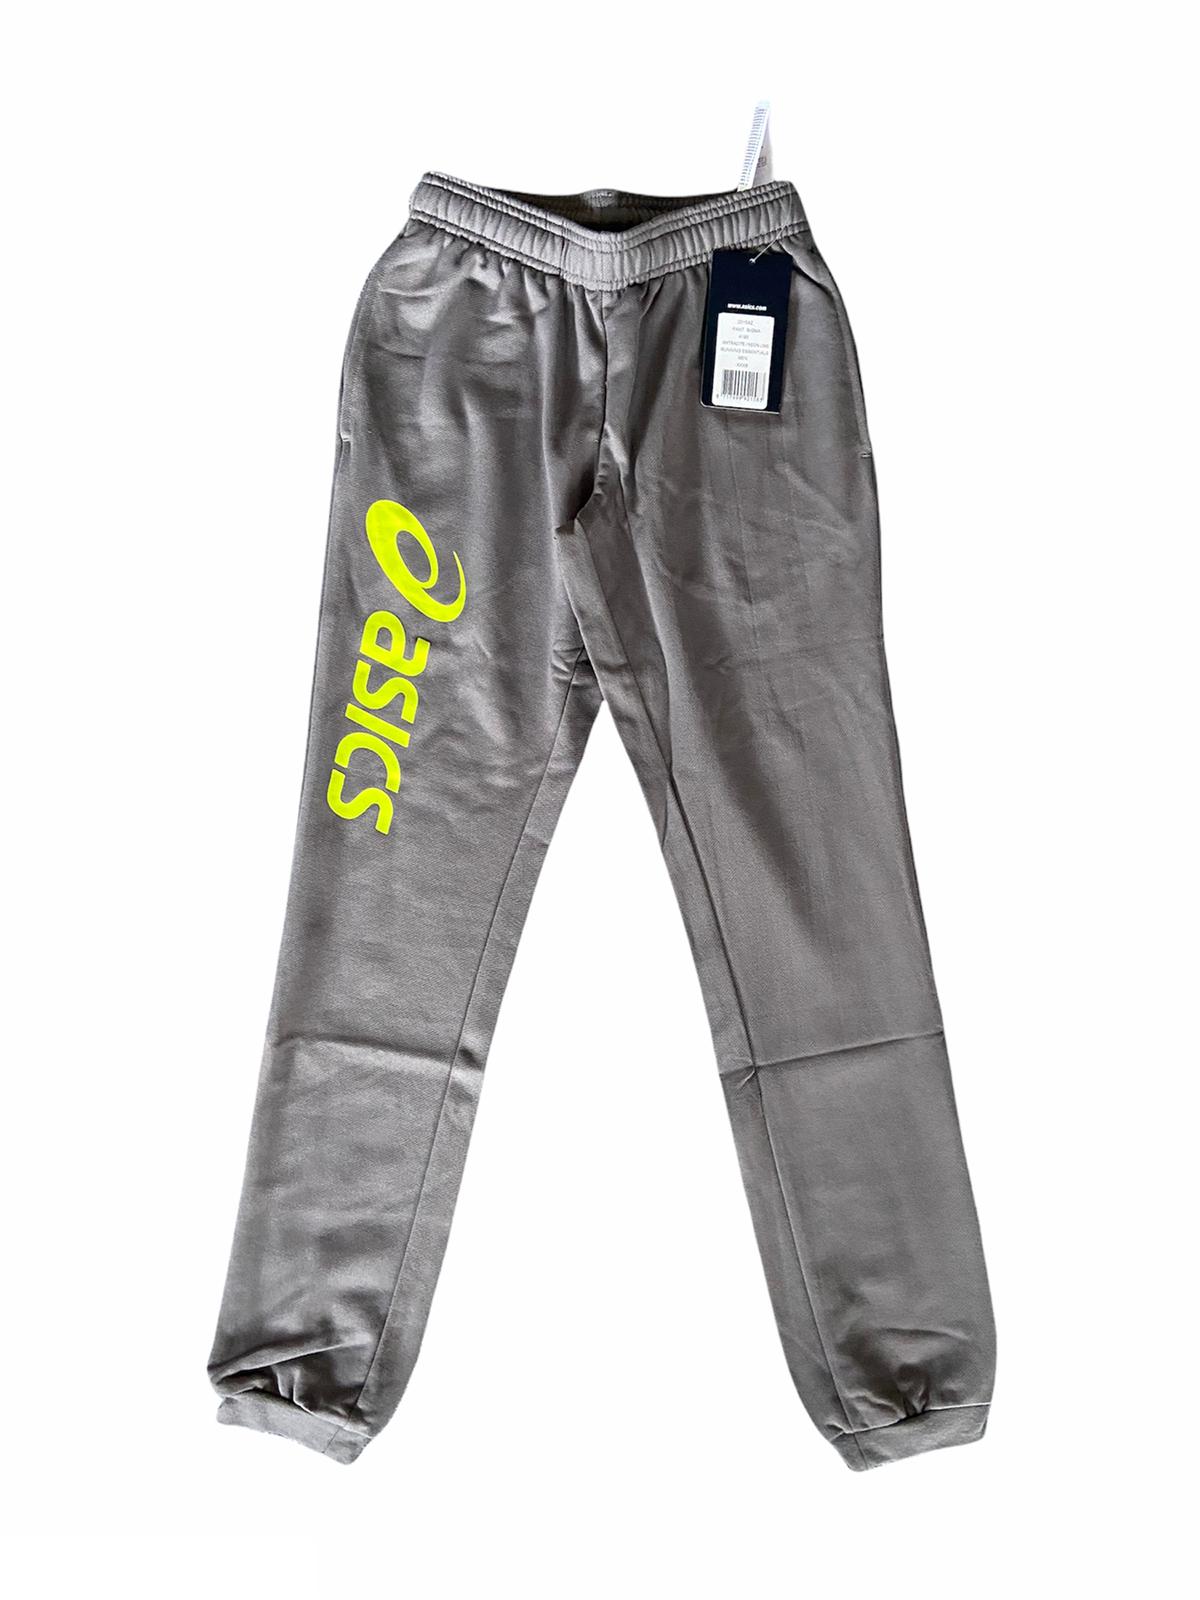 Asics Running Pants Men's Sigma Large Logo Graphic Pants - Grey - New